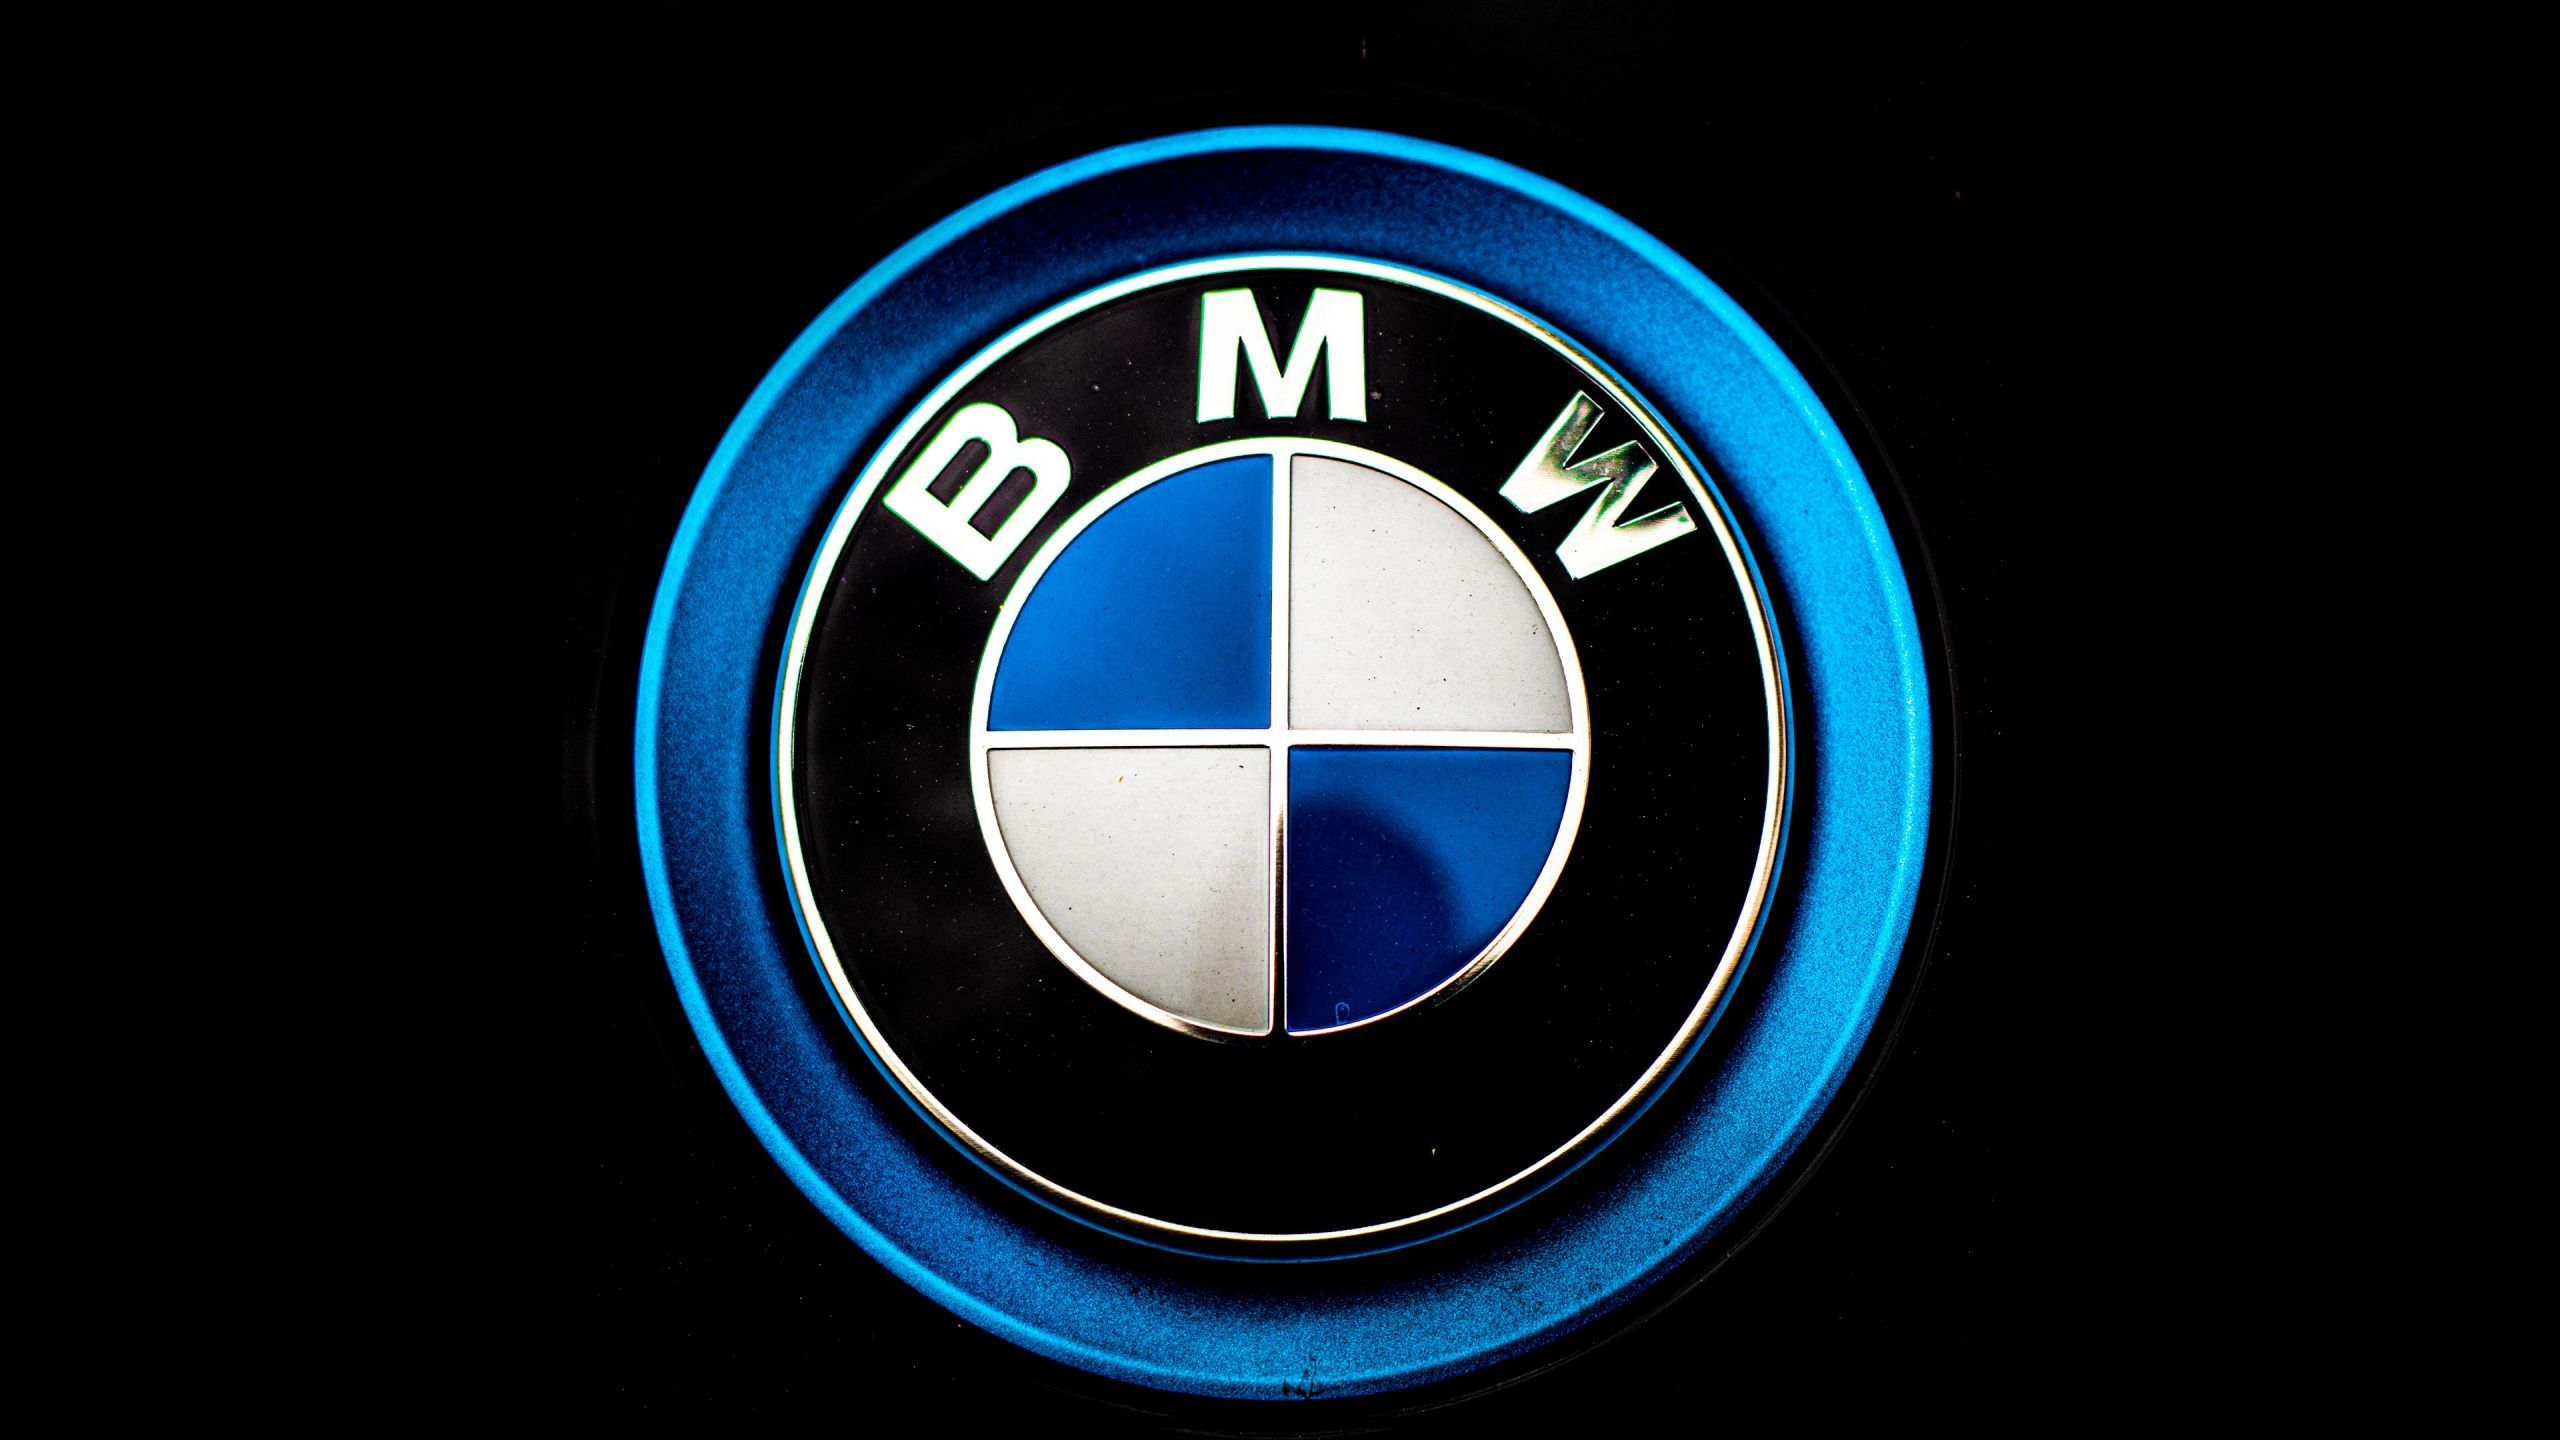 Simple Bmw Logo Wallpaper In 2560x1440 Resolution